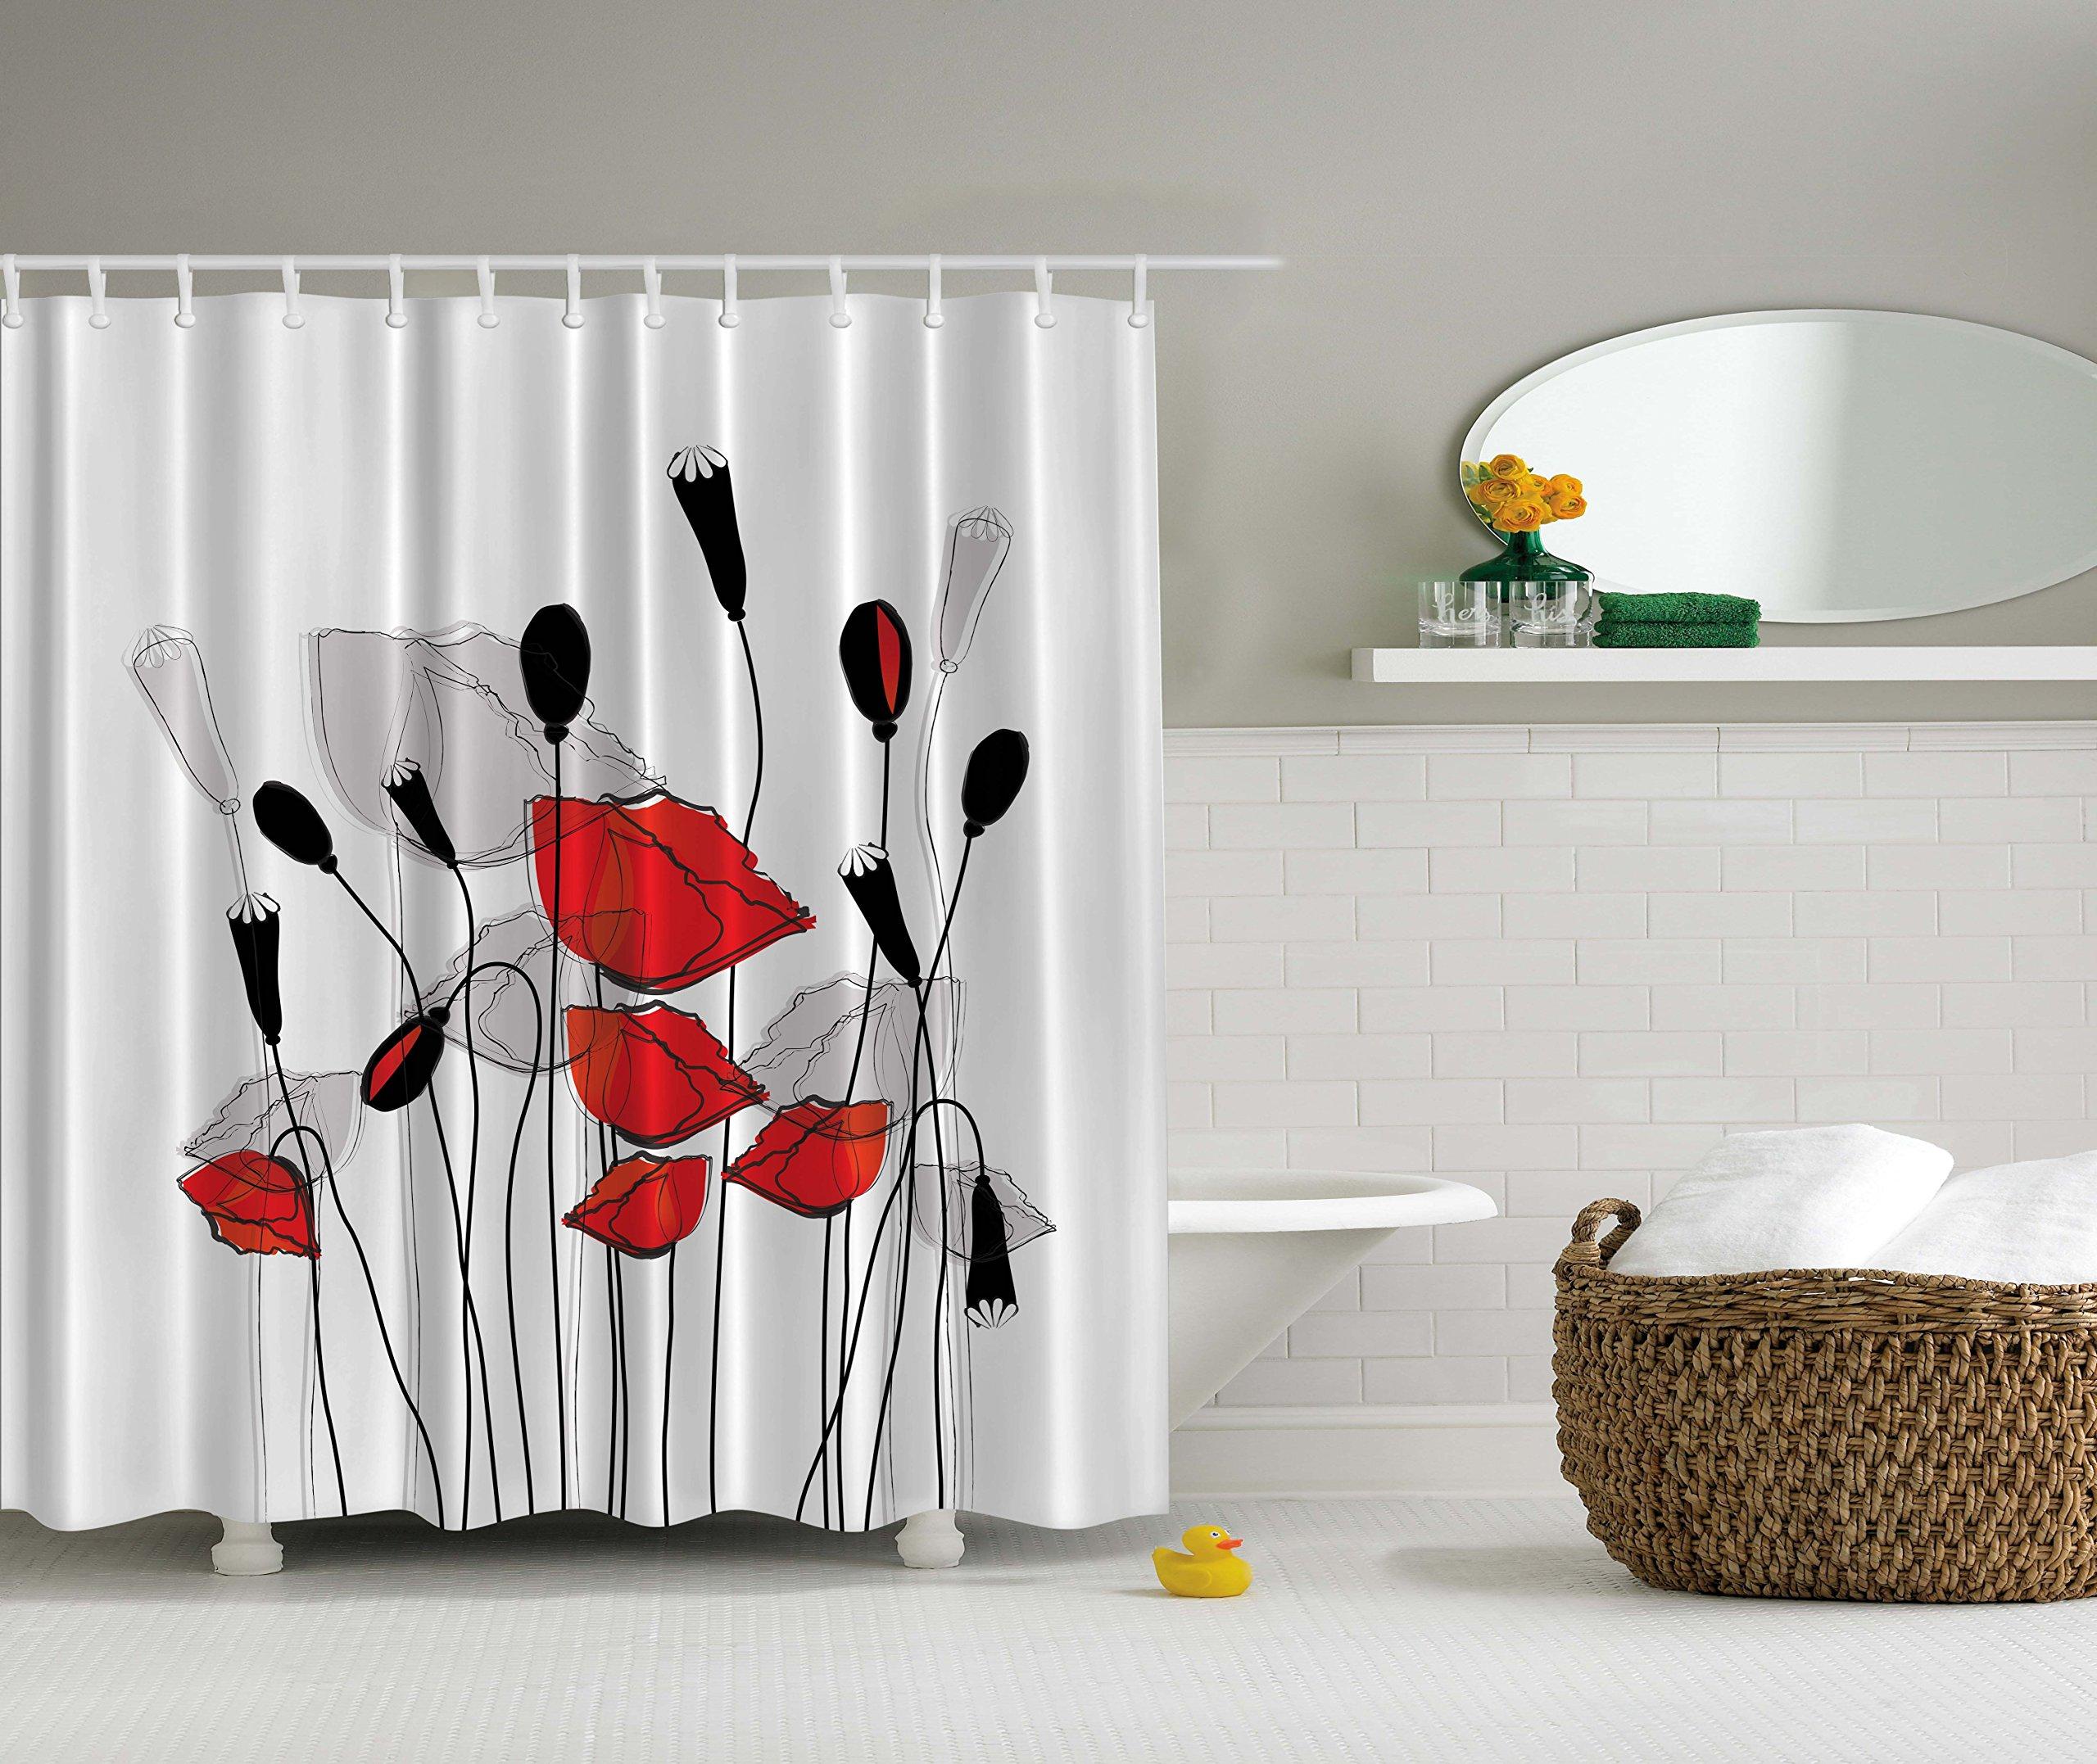 poppy fabric shower curtain. Black Bedroom Furniture Sets. Home Design Ideas